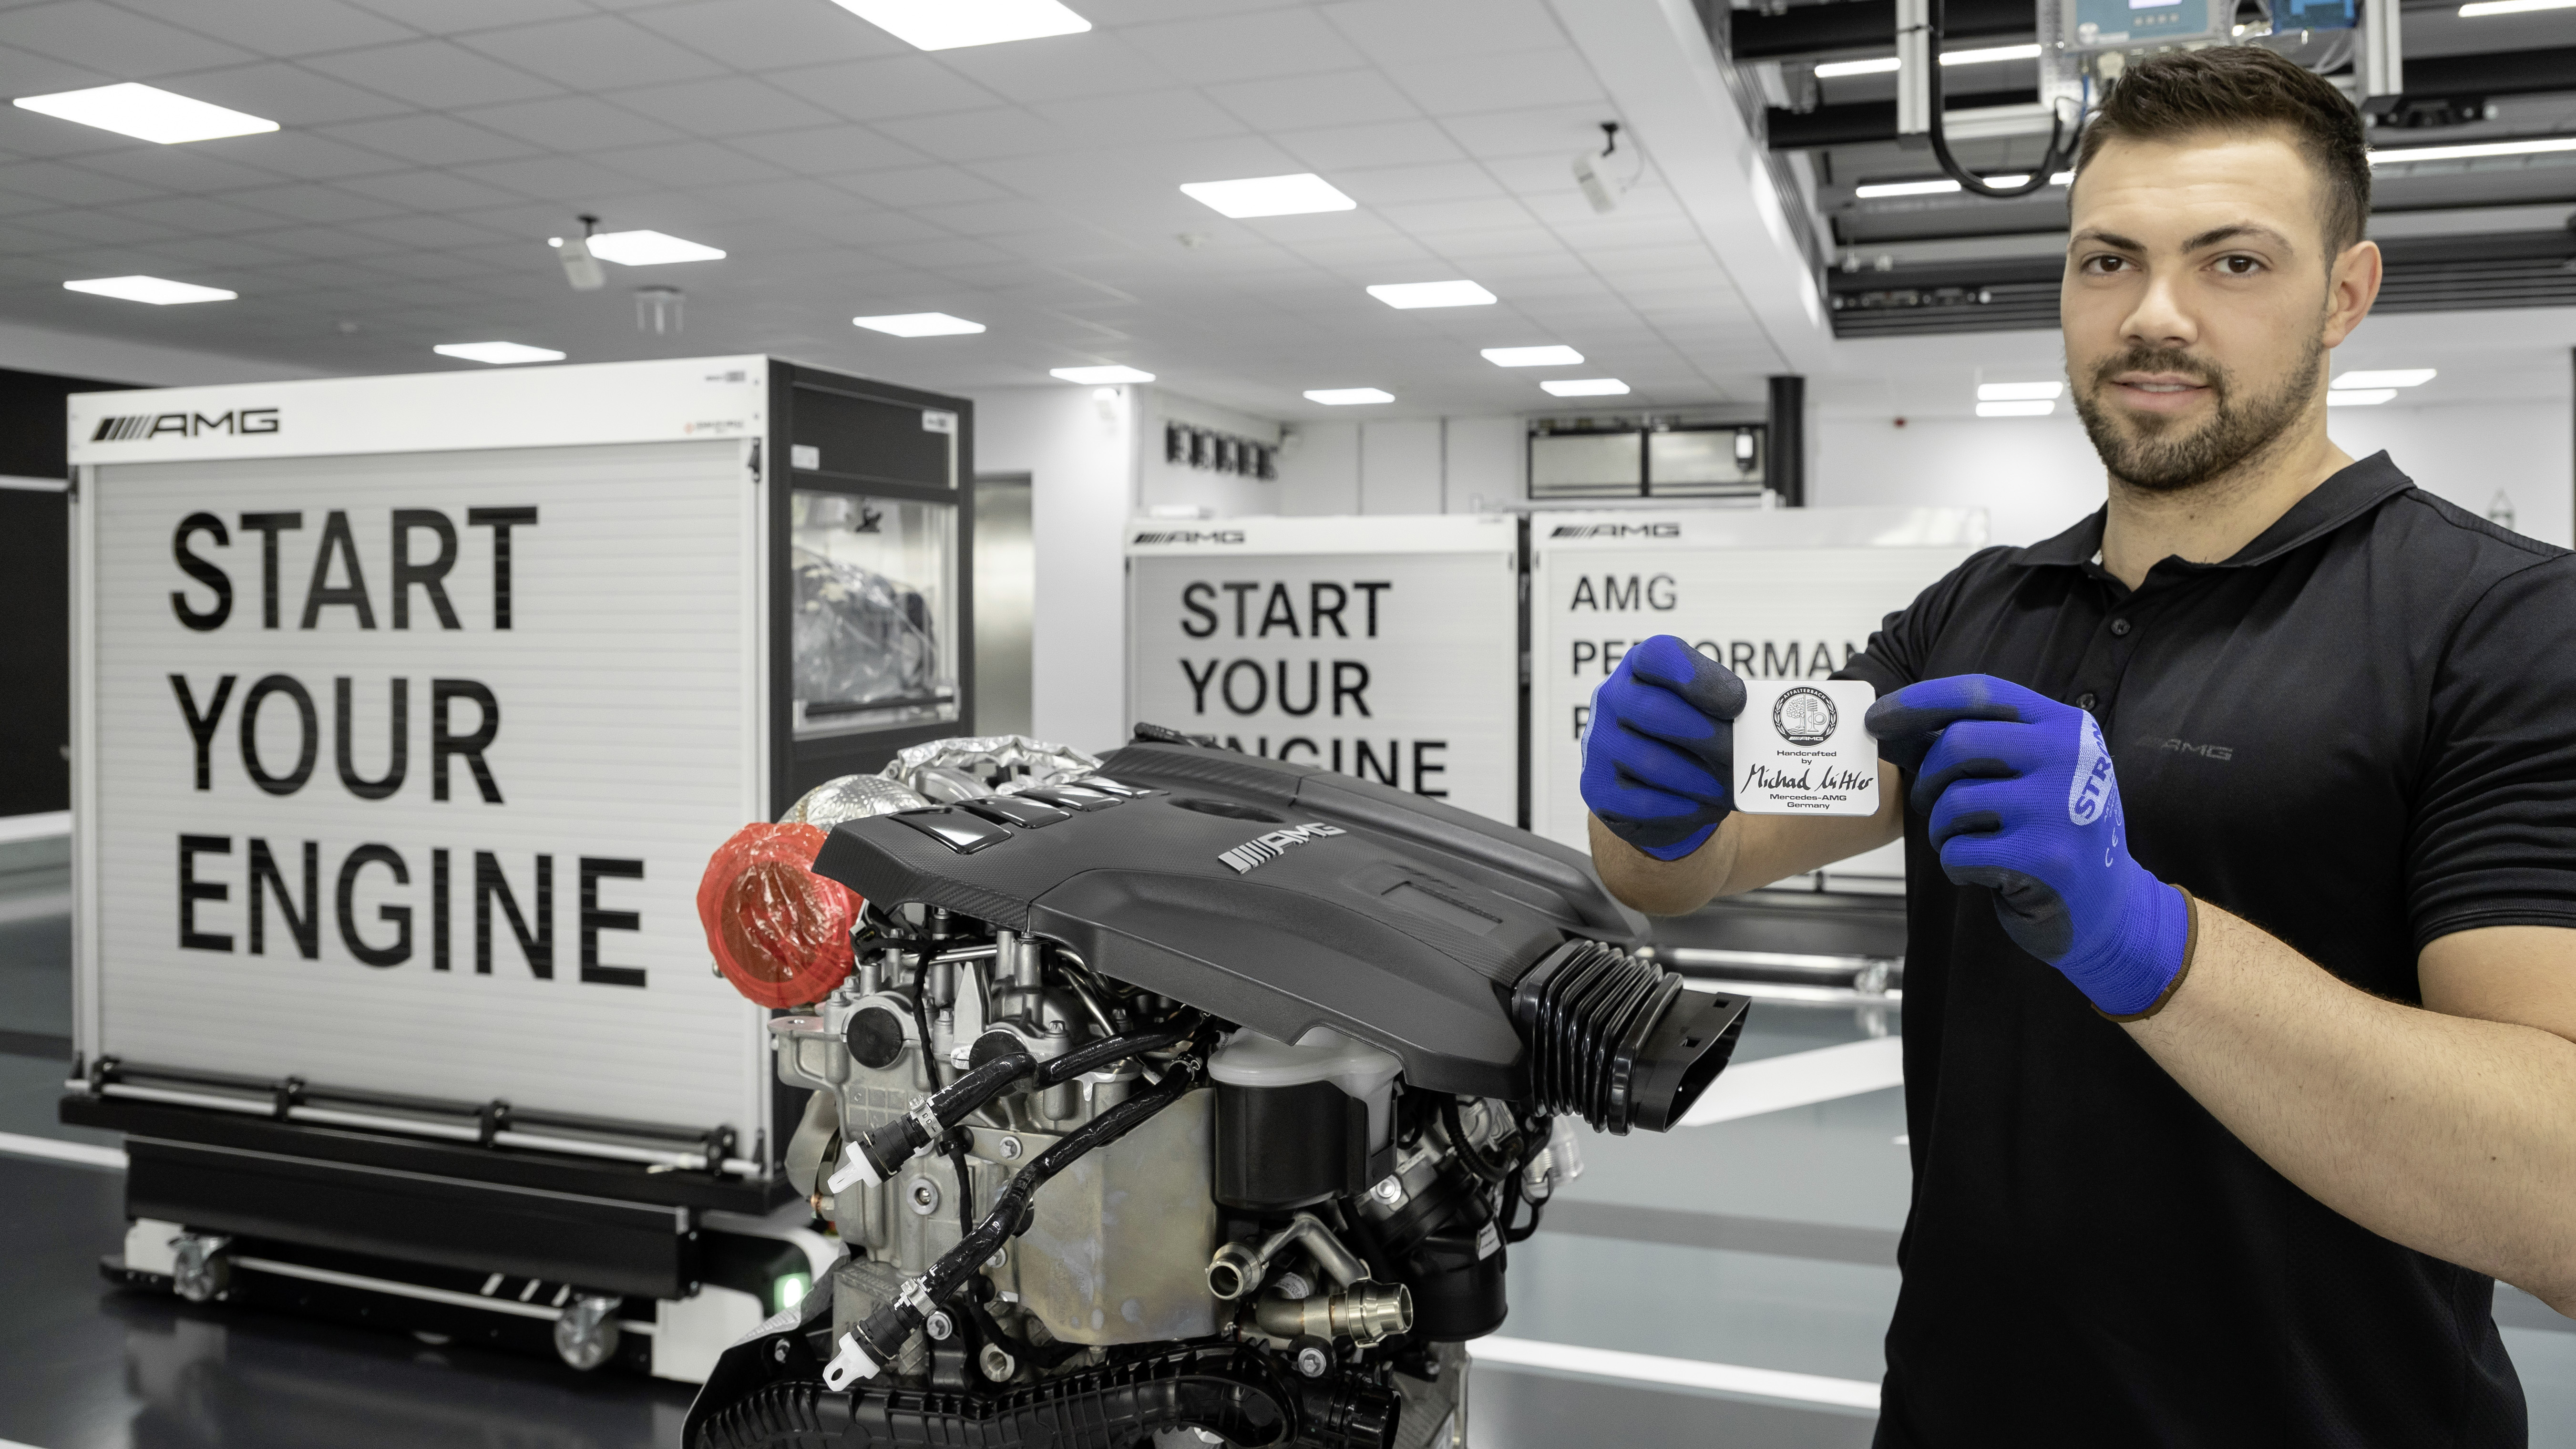 Mercedes-AMG M 139 'one man, one engine'